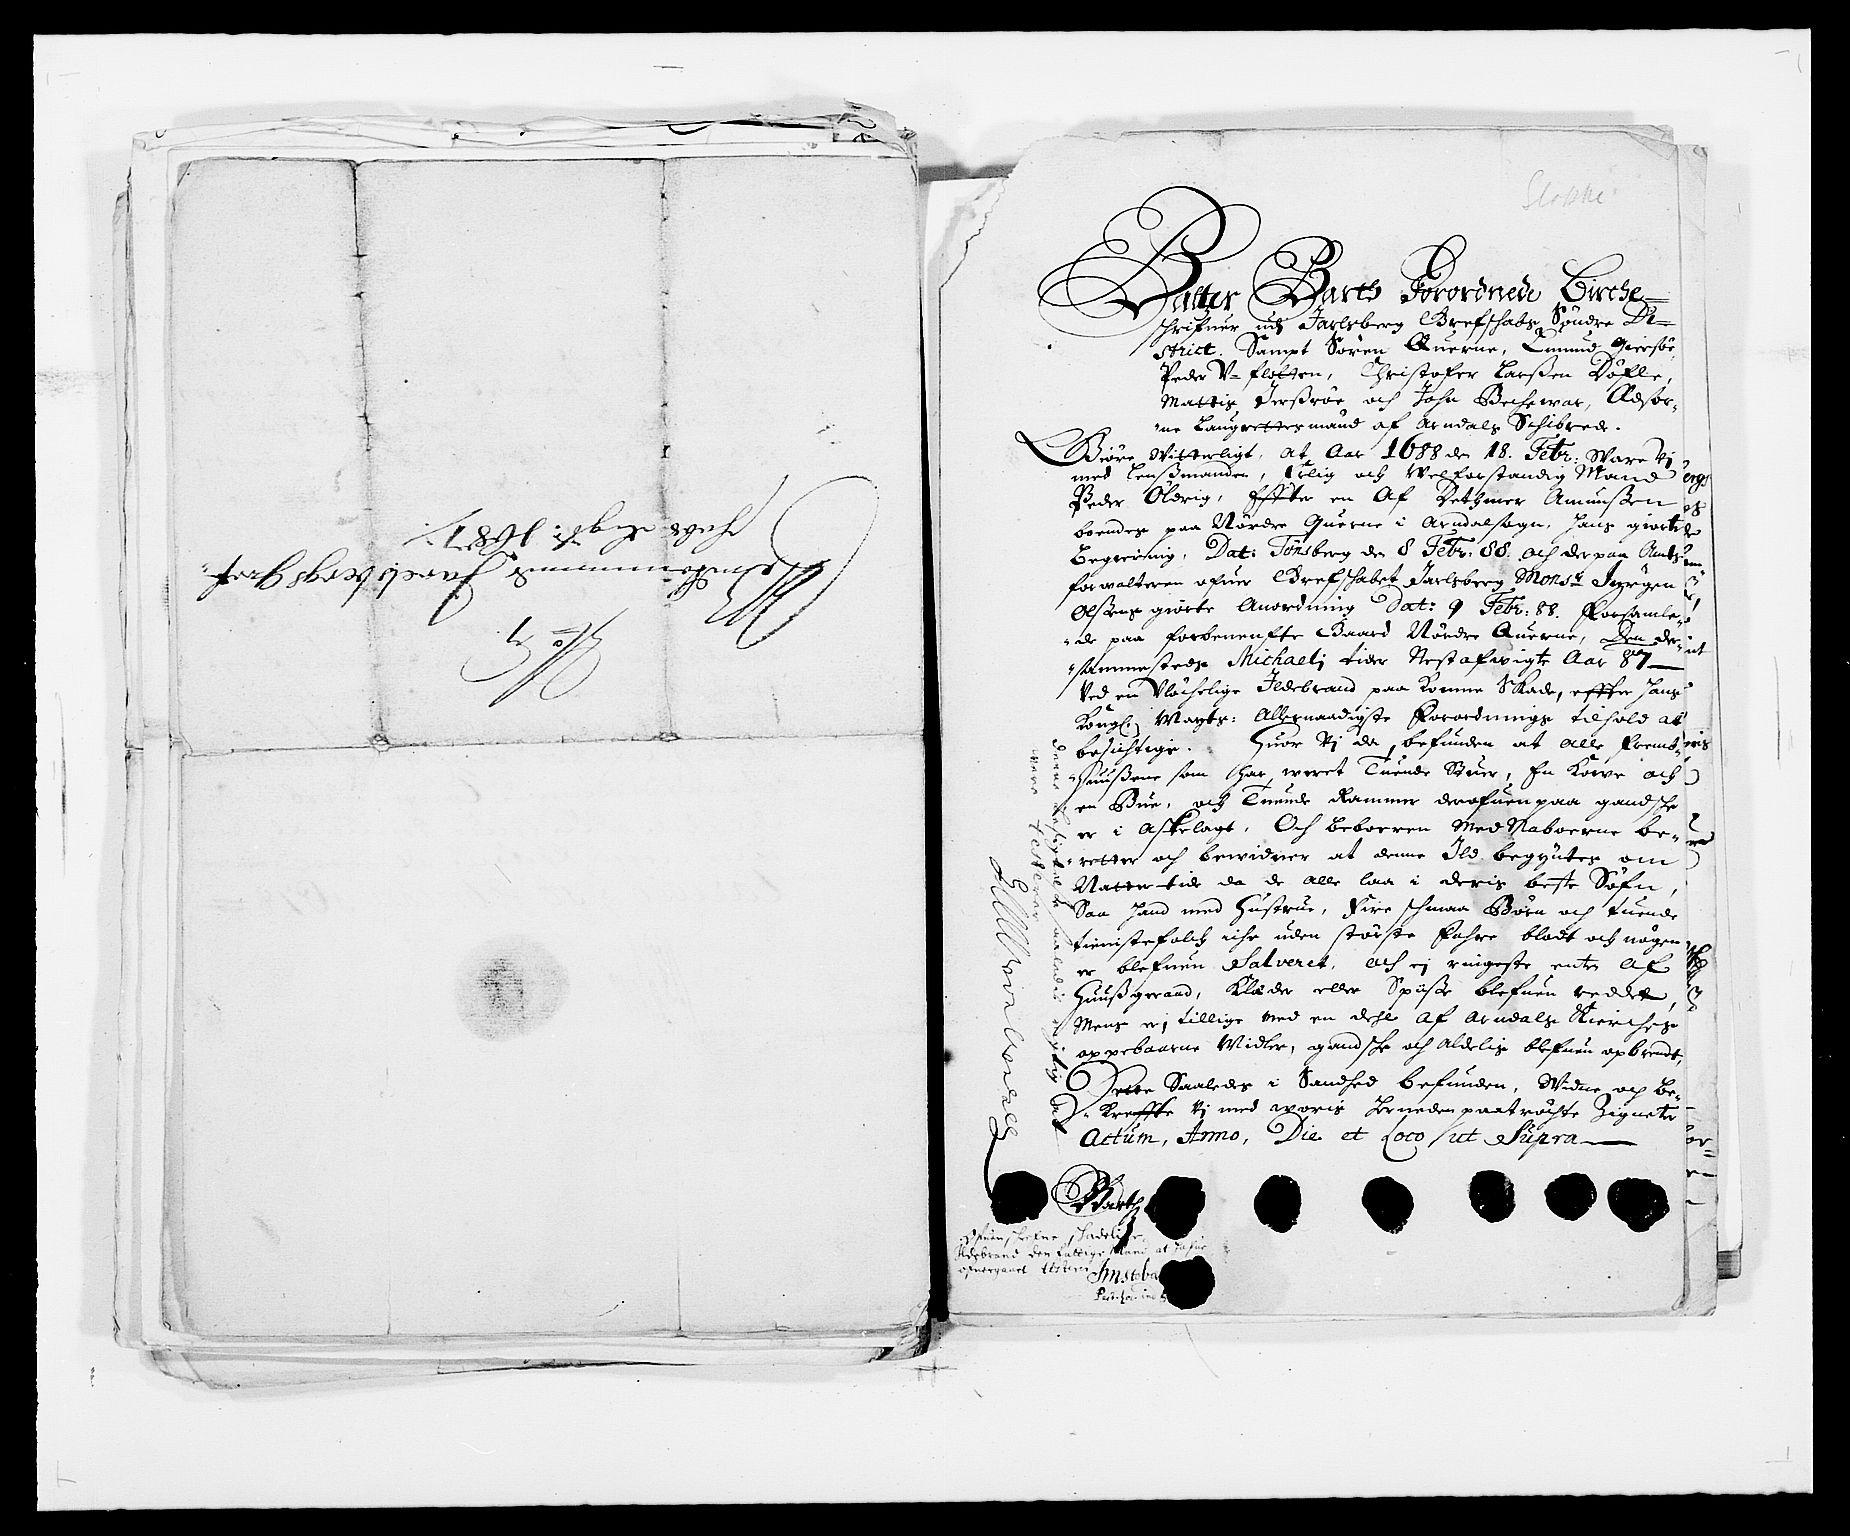 RA, Rentekammeret inntil 1814, Reviderte regnskaper, Fogderegnskap, R32/L1859: Fogderegnskap Jarlsberg grevskap, 1686-1690, s. 363